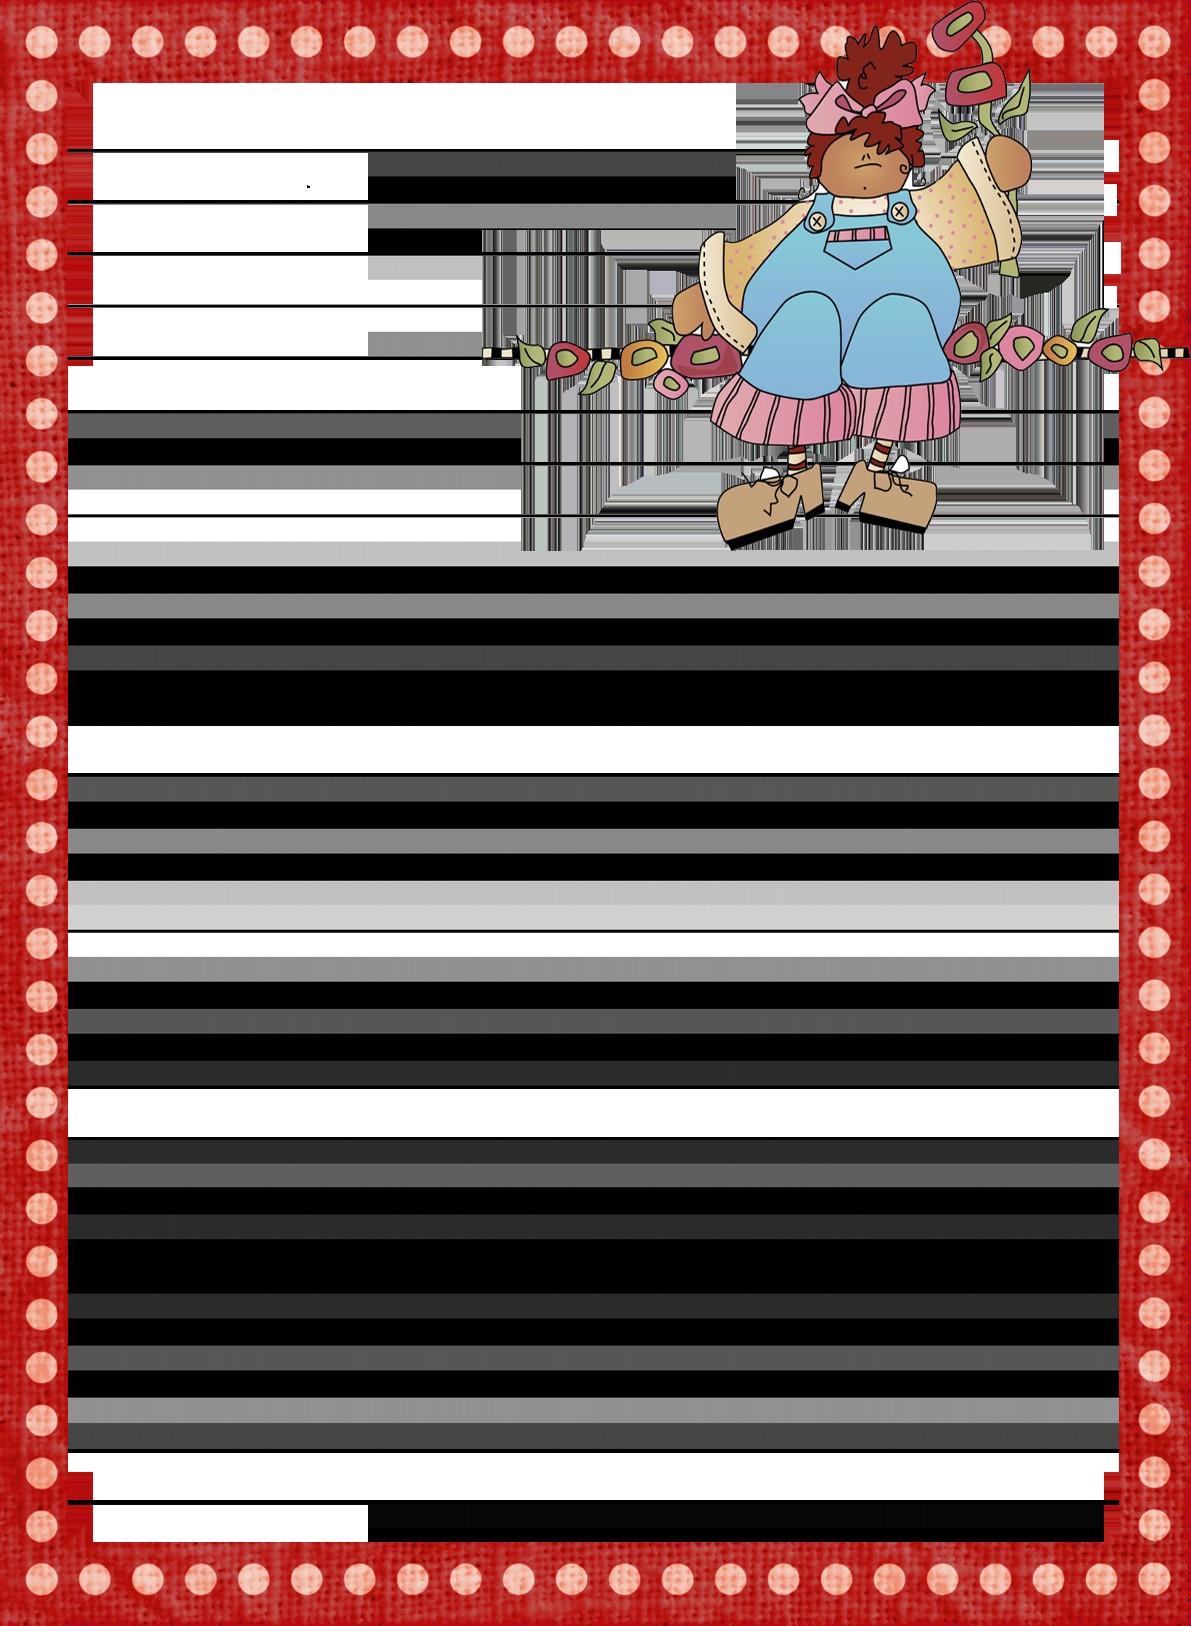 Papercraft Letters Hoja 2 ΣΧΟΛΕΙΟ ΠΛΑΙΣΙΑ ΣΕΛΙΔΩΝ Pinterest